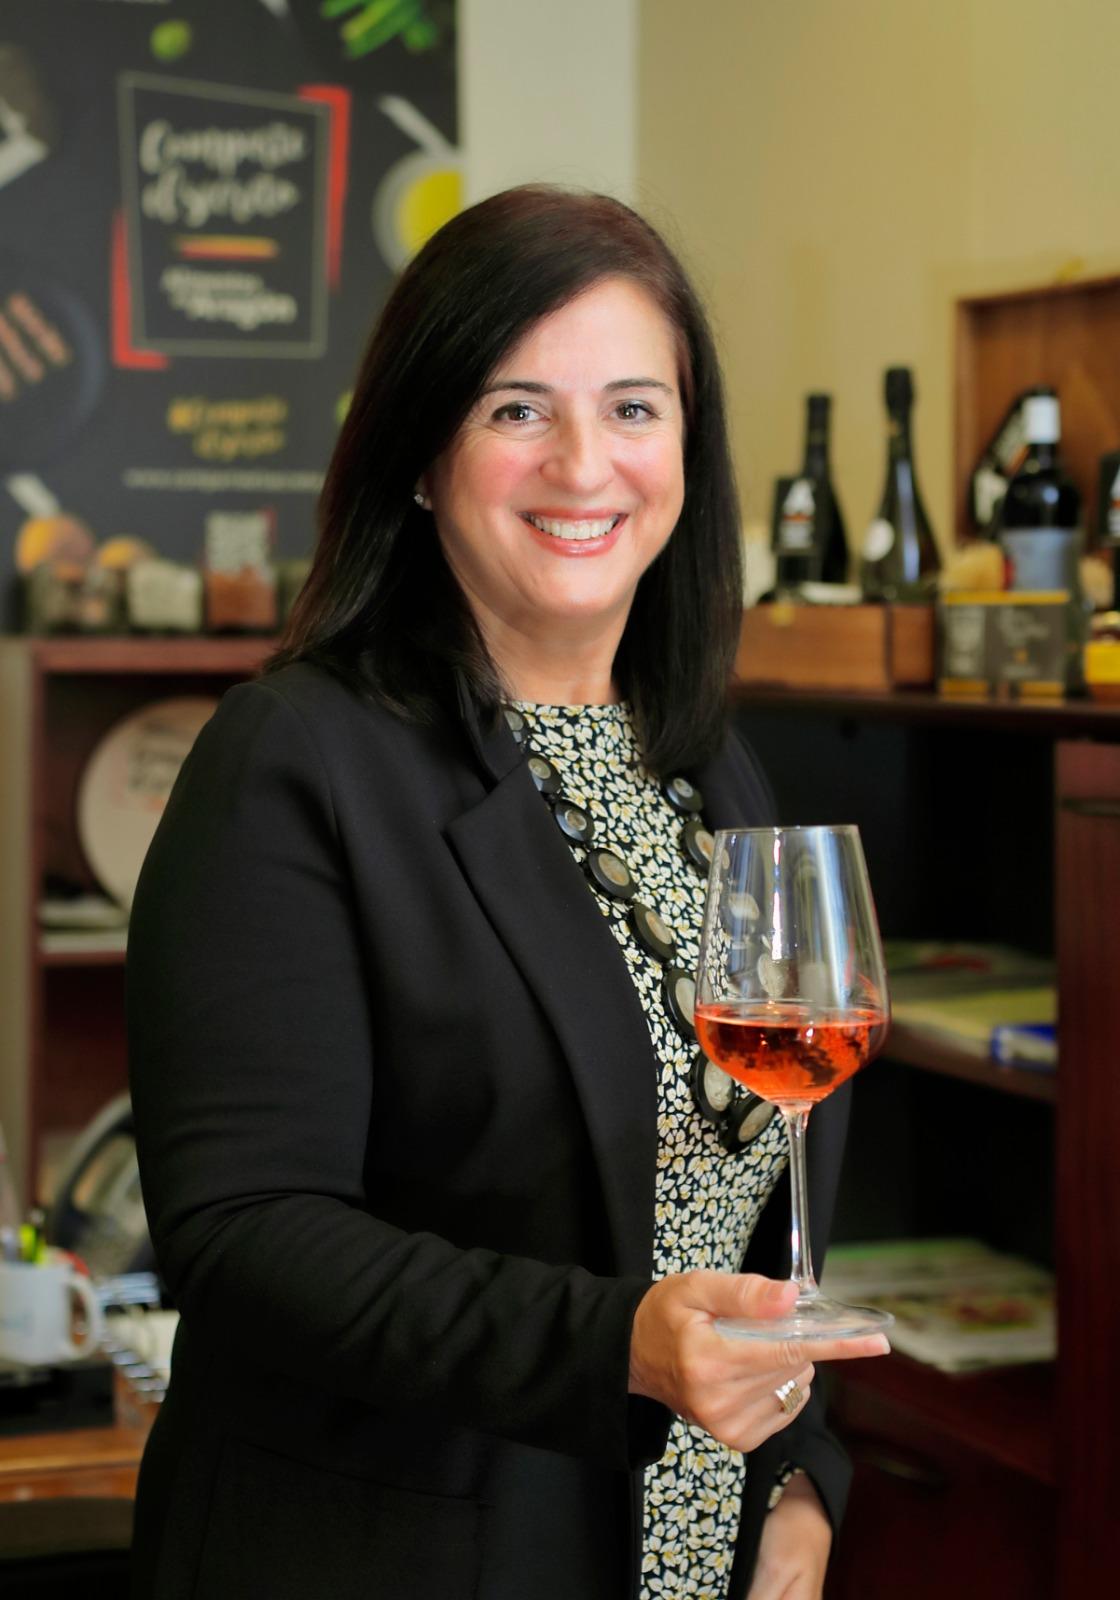 Carmen Urbano winelover Gabi Orte